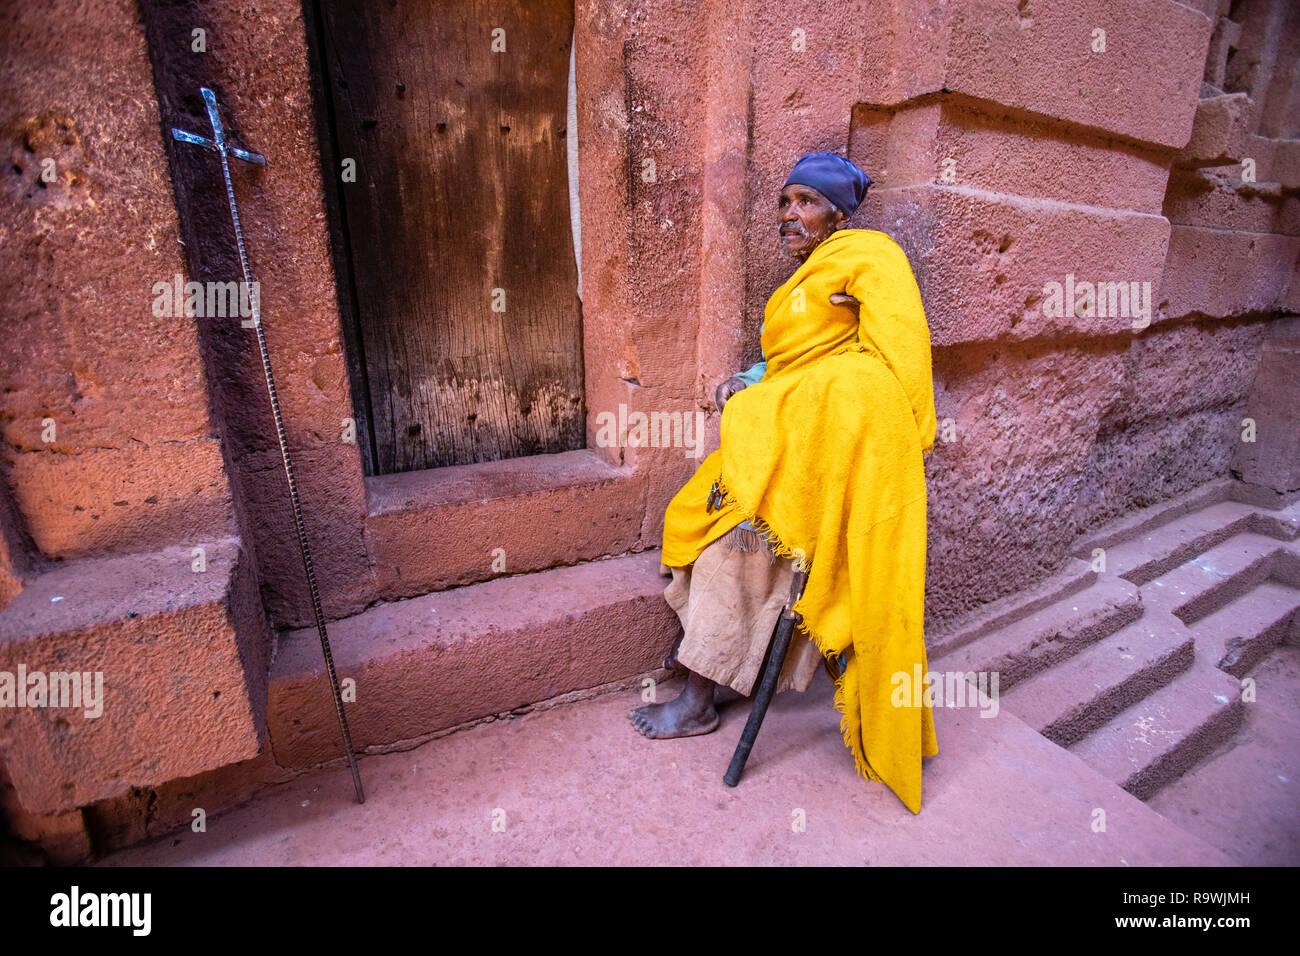 Worshiper at the rock-cut church of House of Immanuel at Lalibela, Ethiopia - Stock Image